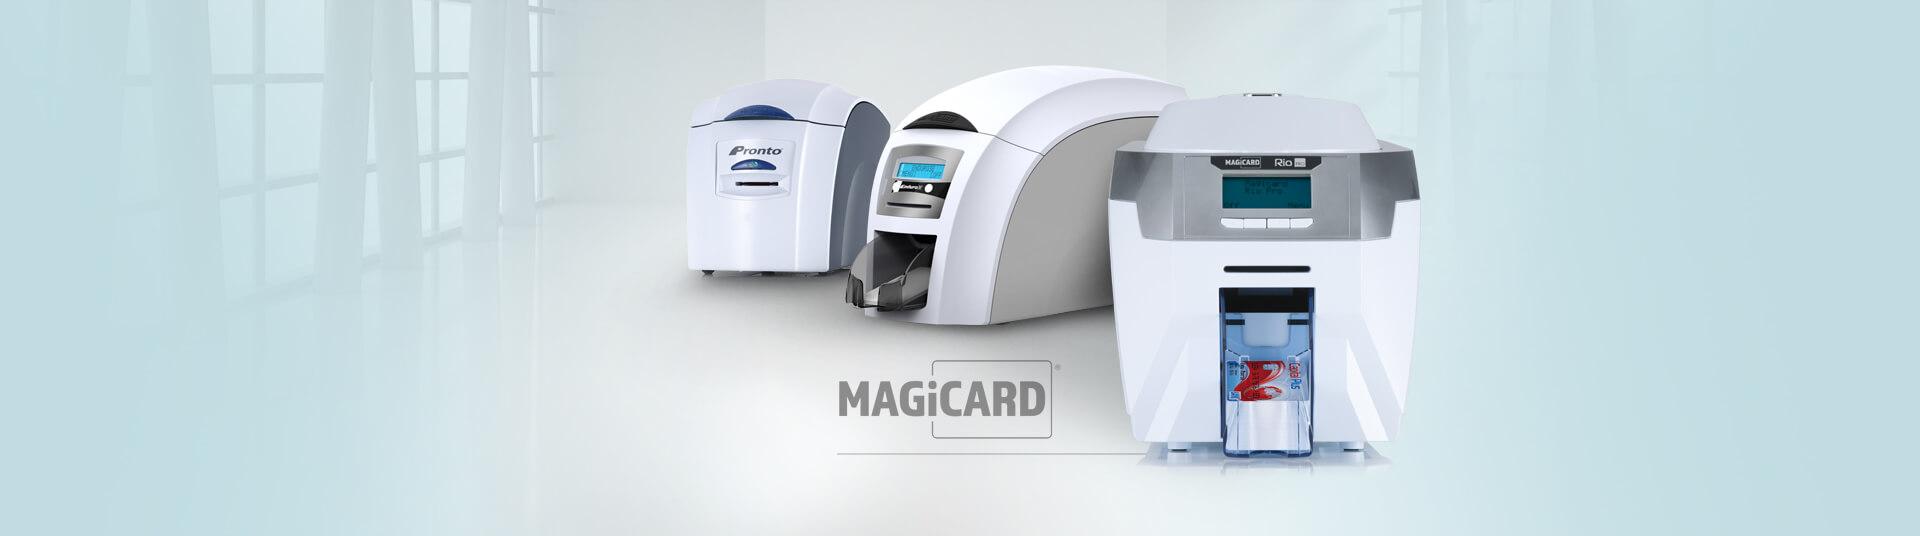 Magicard Photo ID Printer